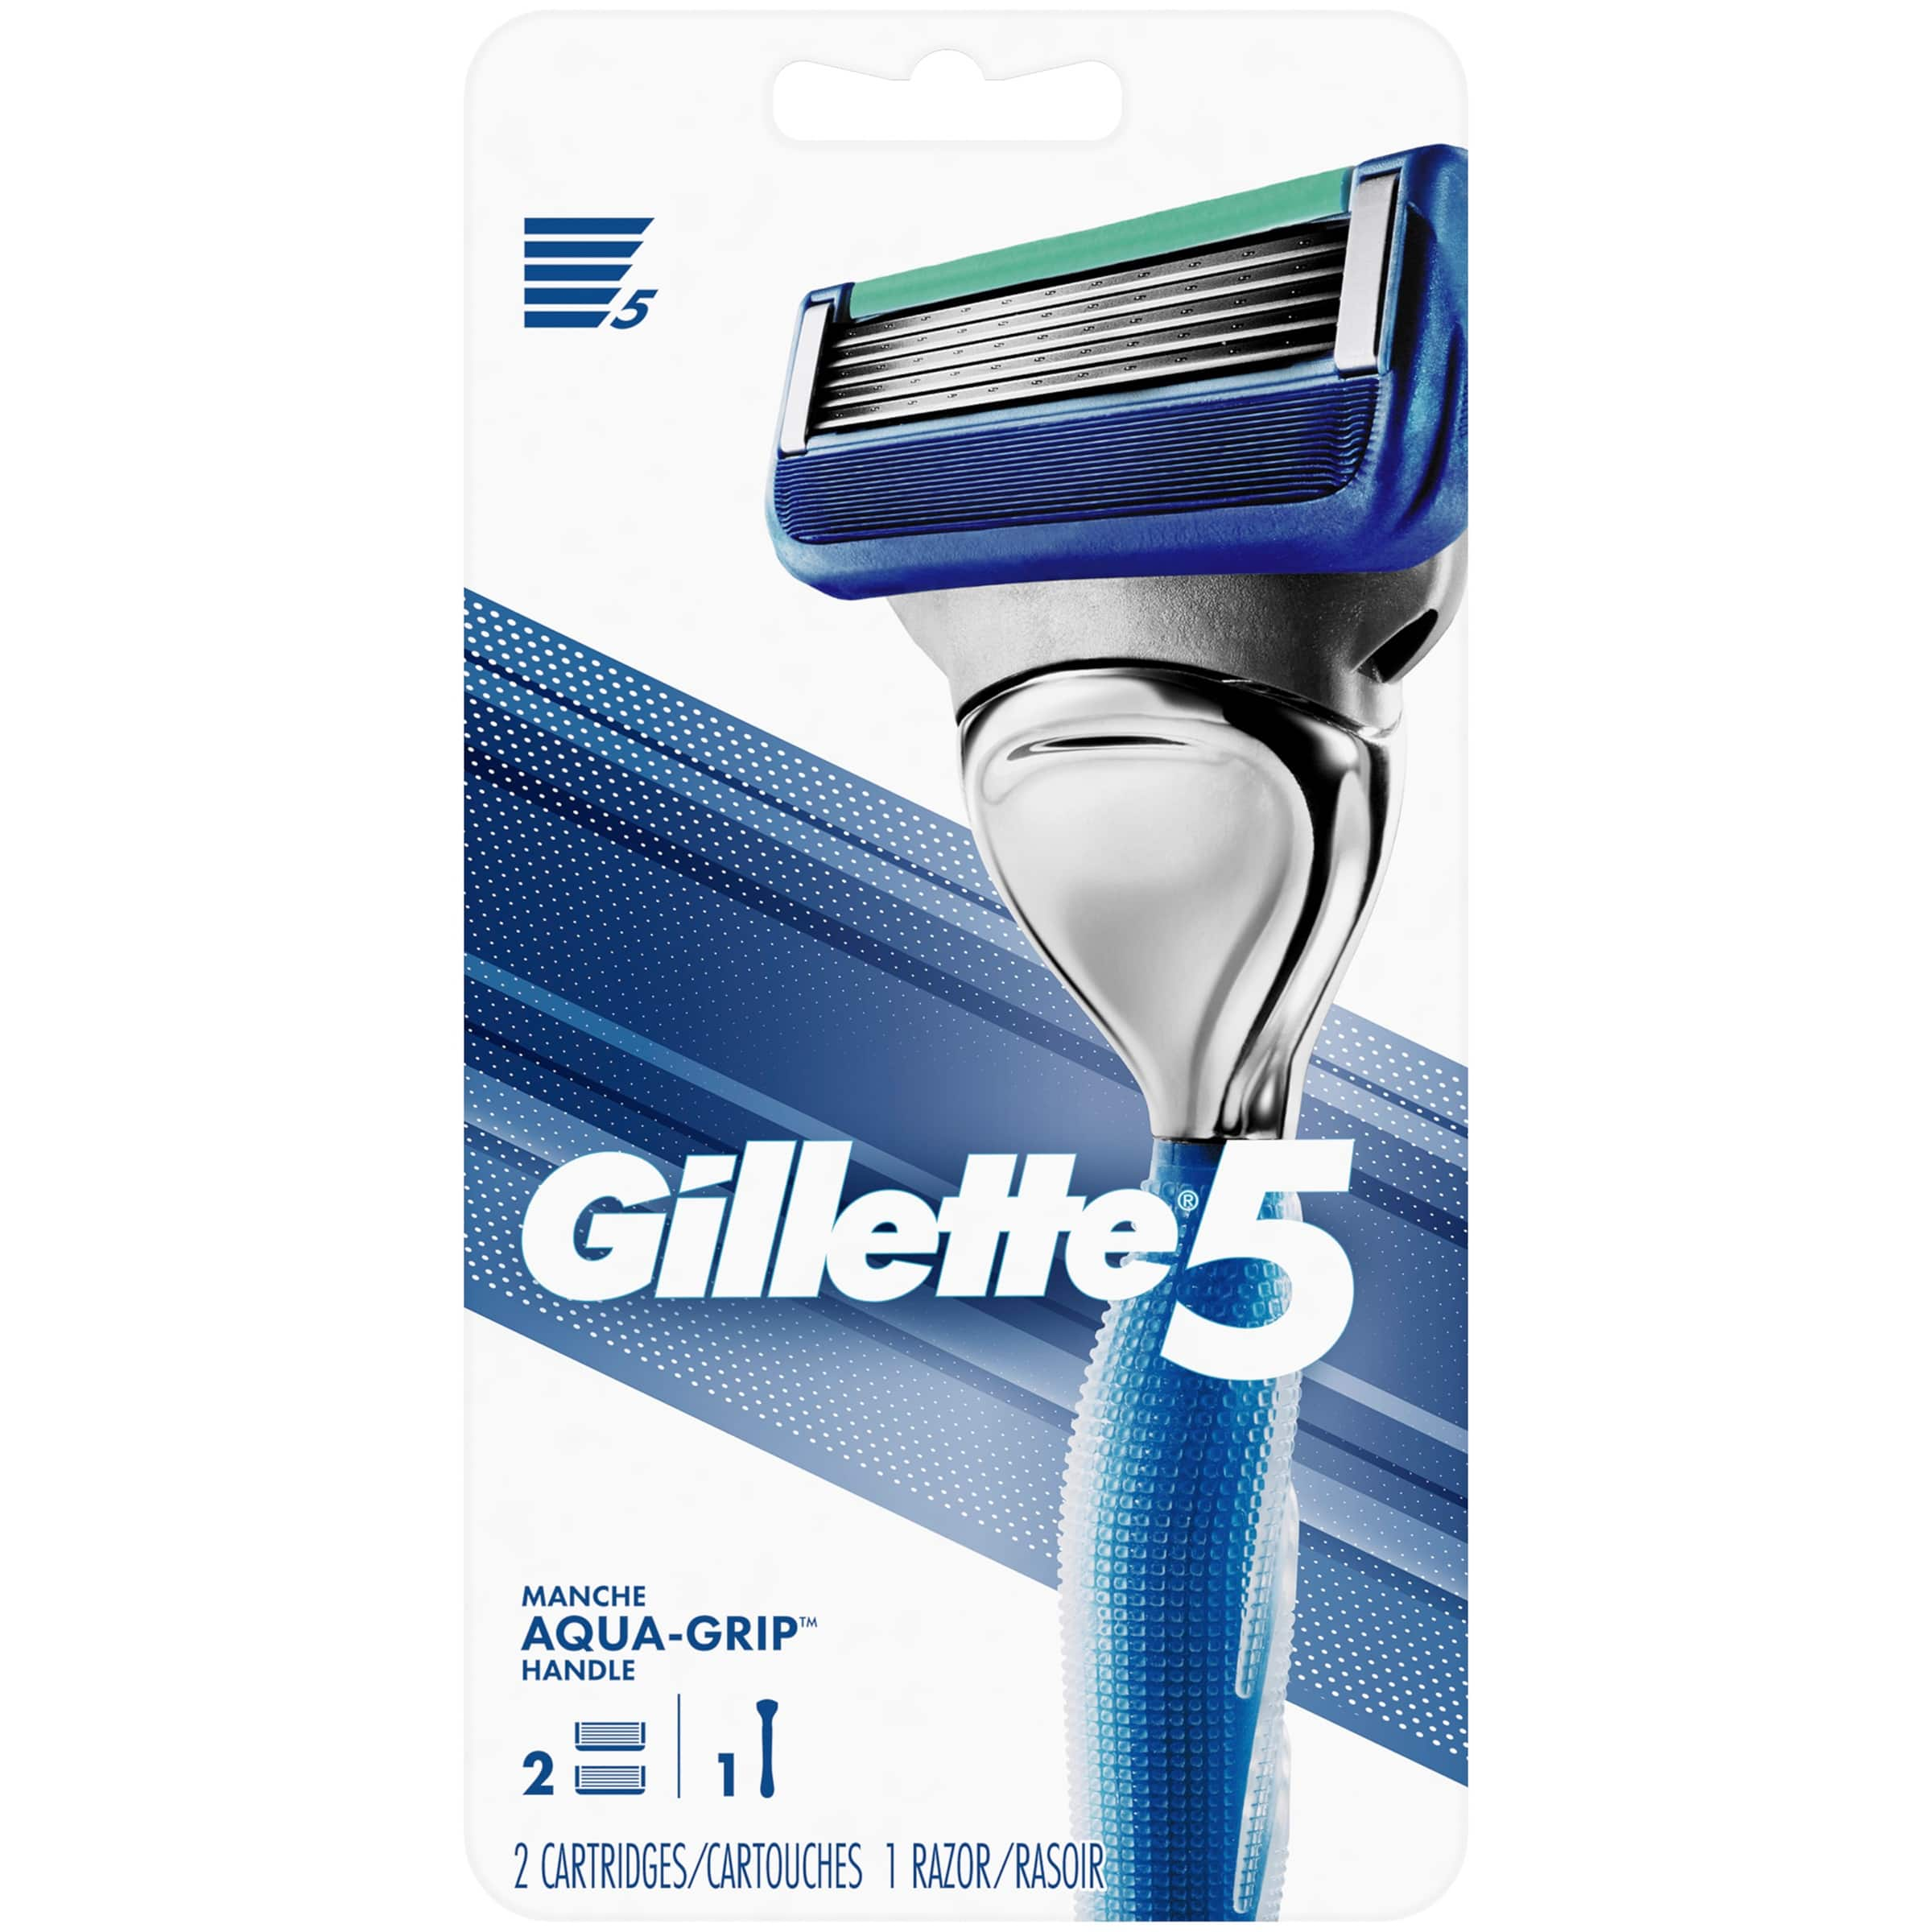 Gillette5 Men's Razor Handle by Gillette + 2 Cartridges $6.93